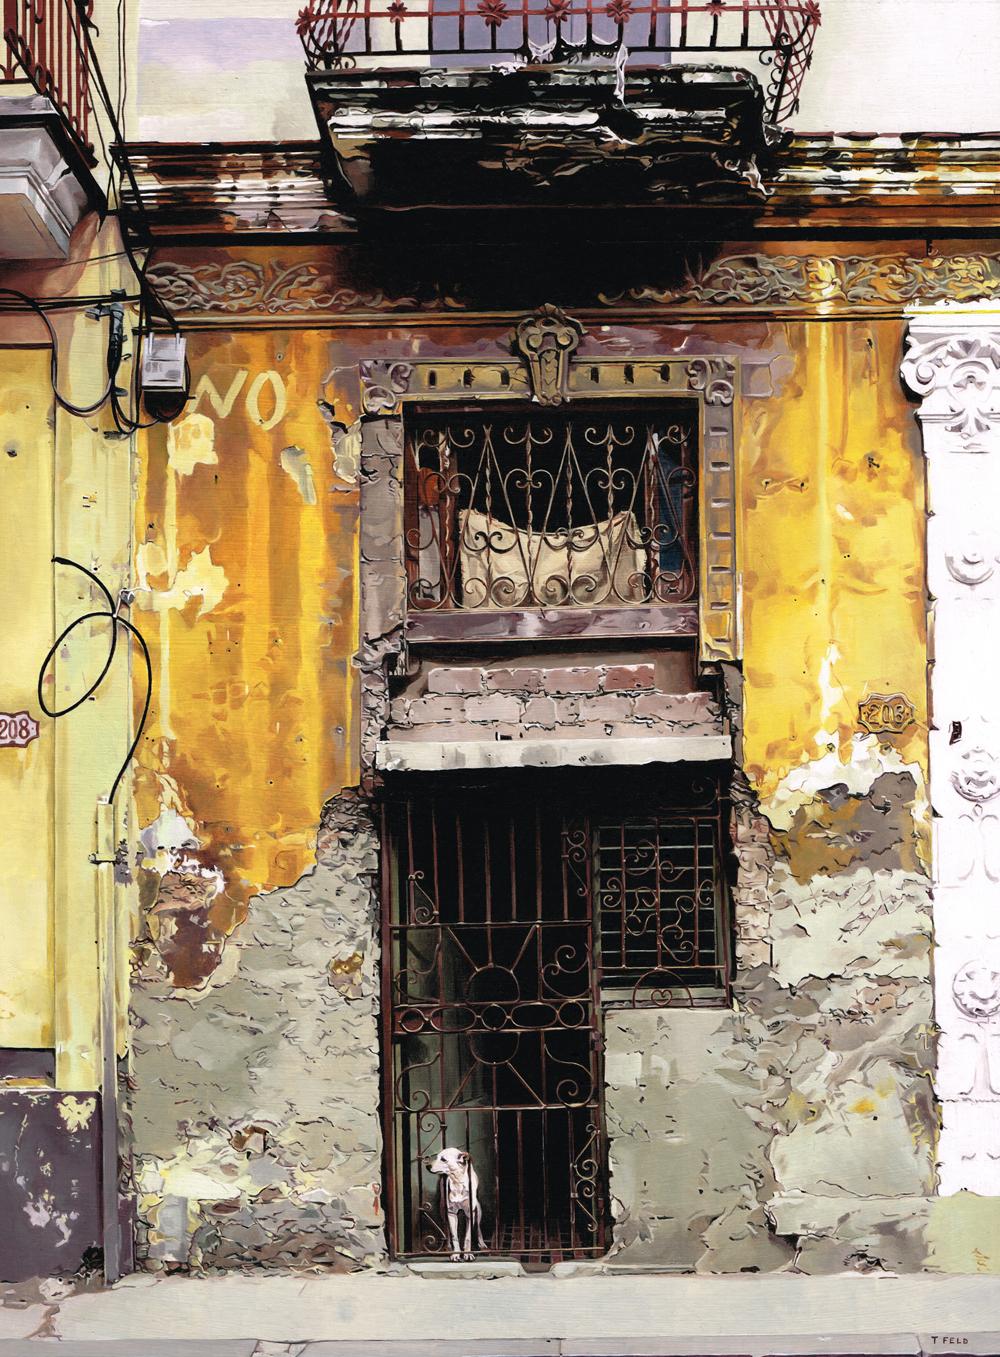 Tony Feld, Havana, Oil on board, 45.5 x 36 x 2,